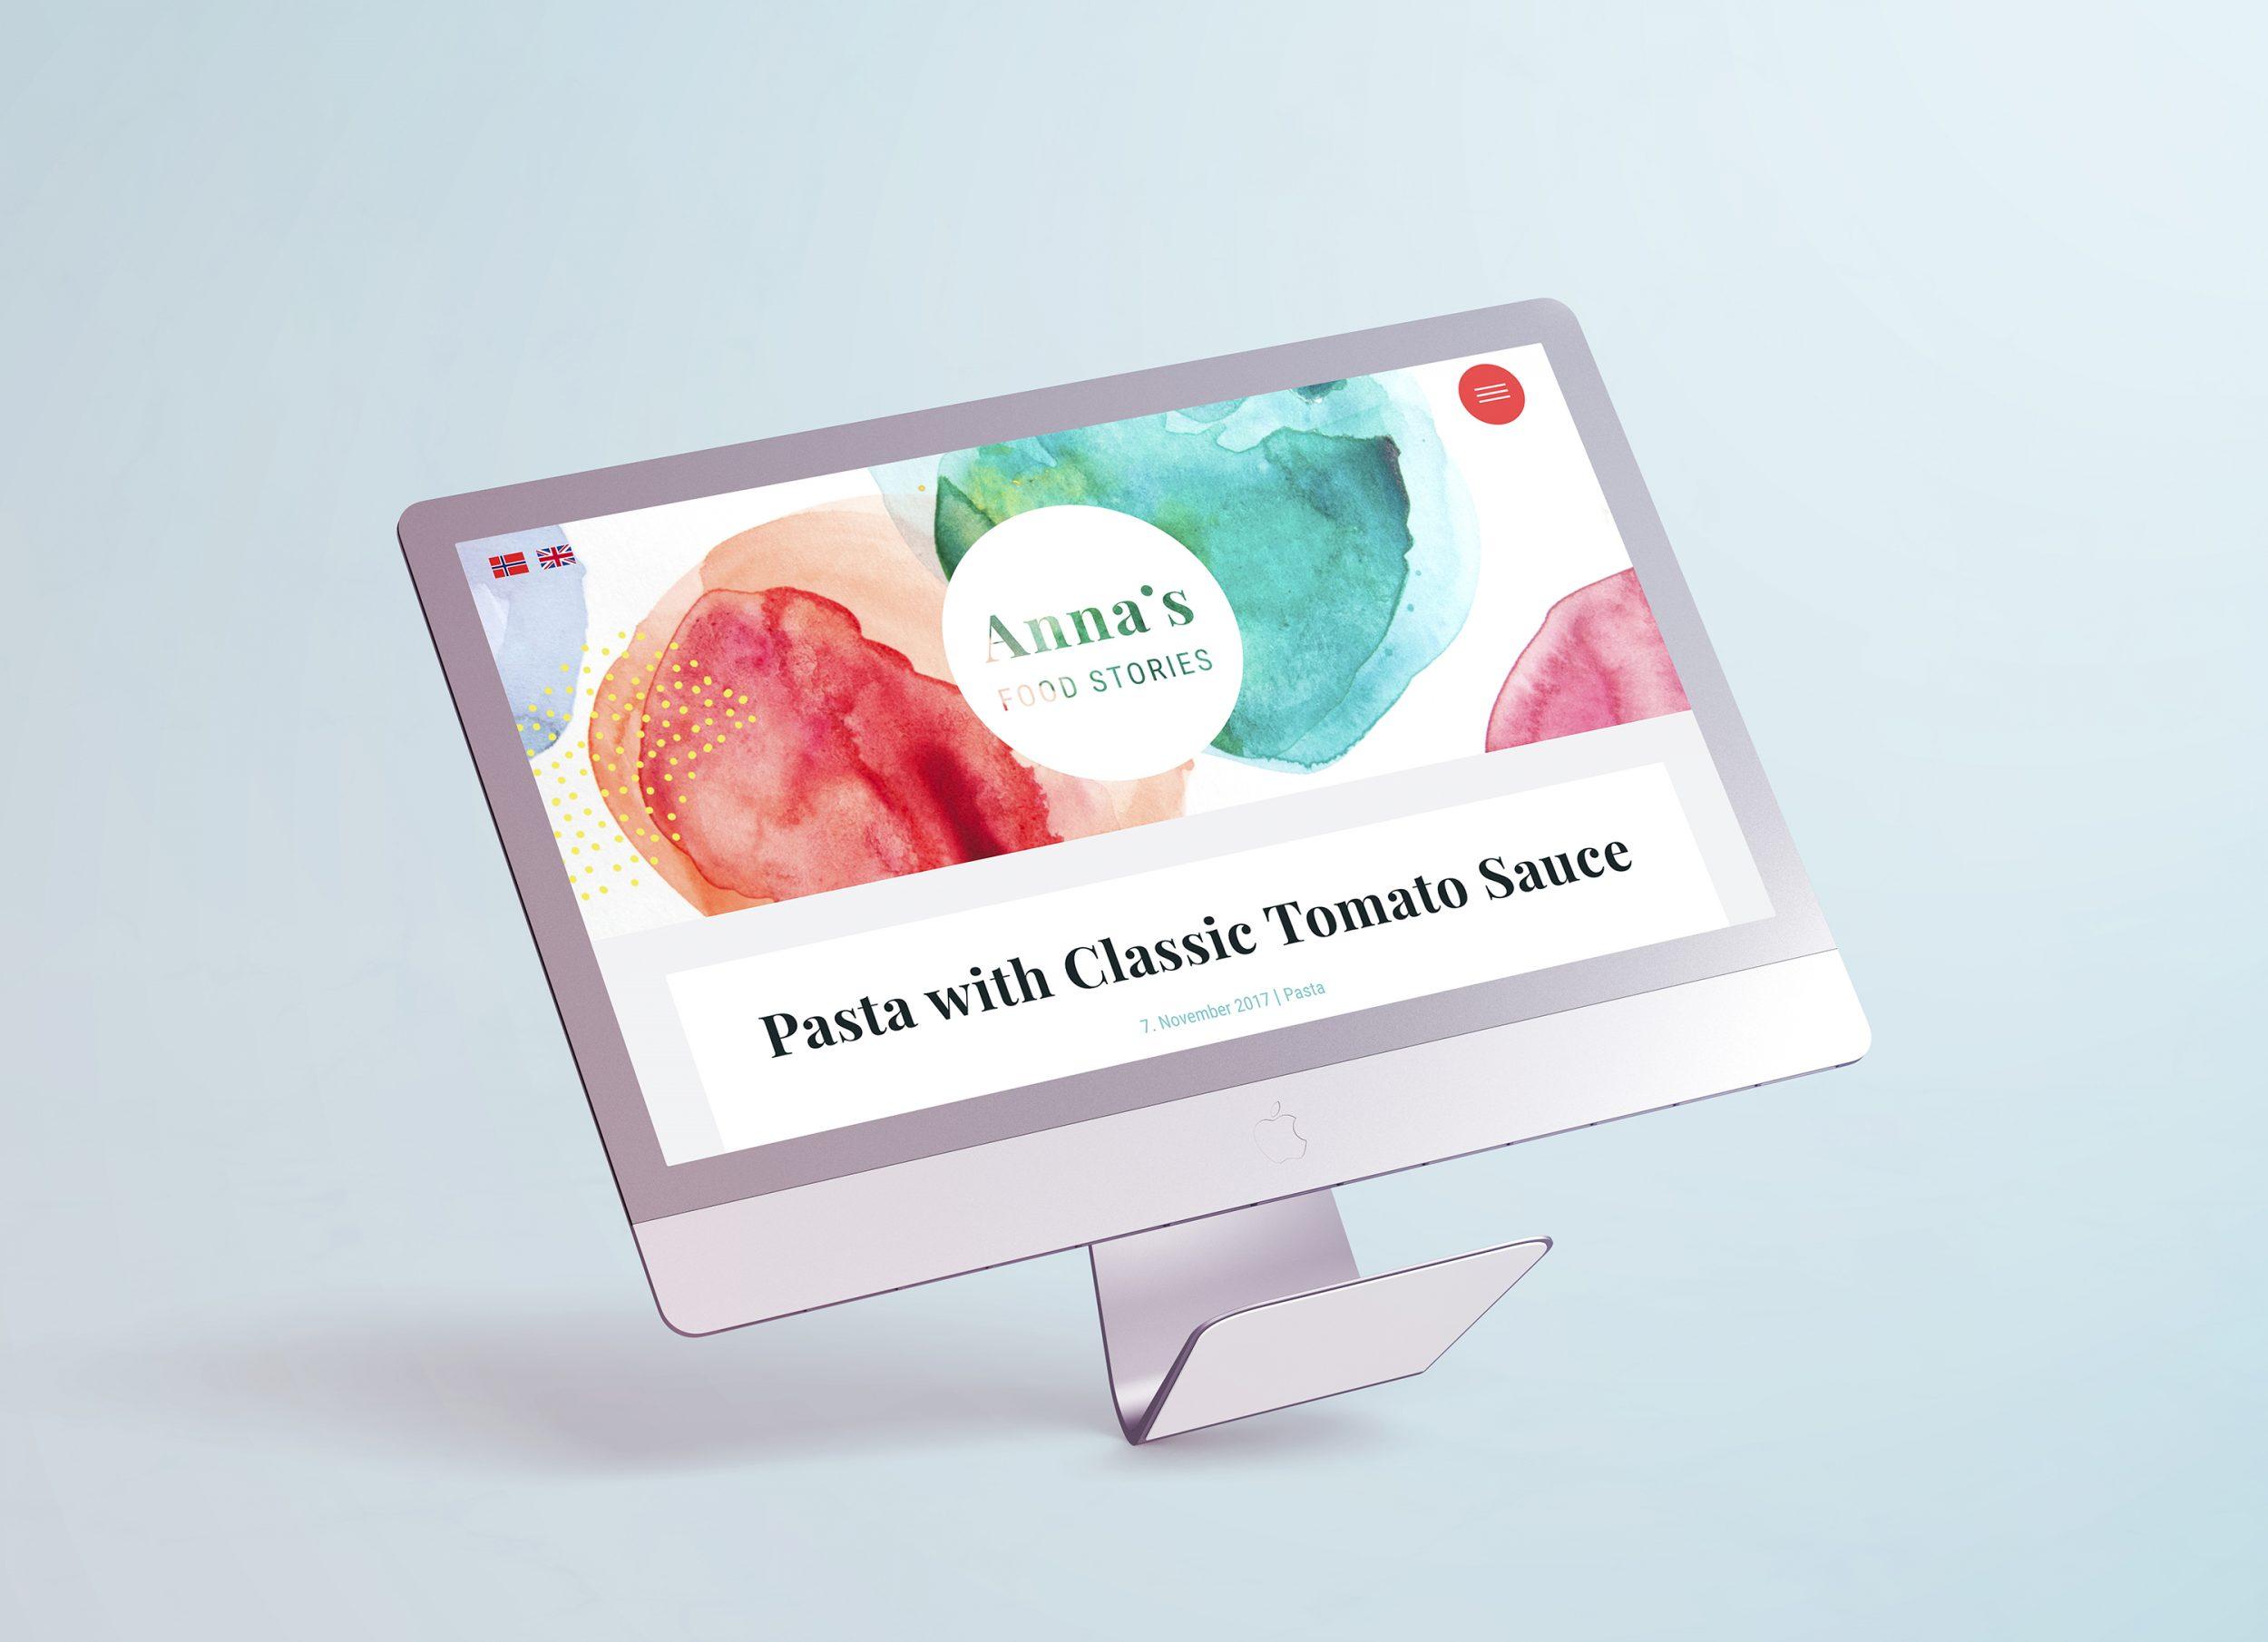 Annas food stories - blogg design - mat - matblogg wordpress illustrasjon logo identitet banner